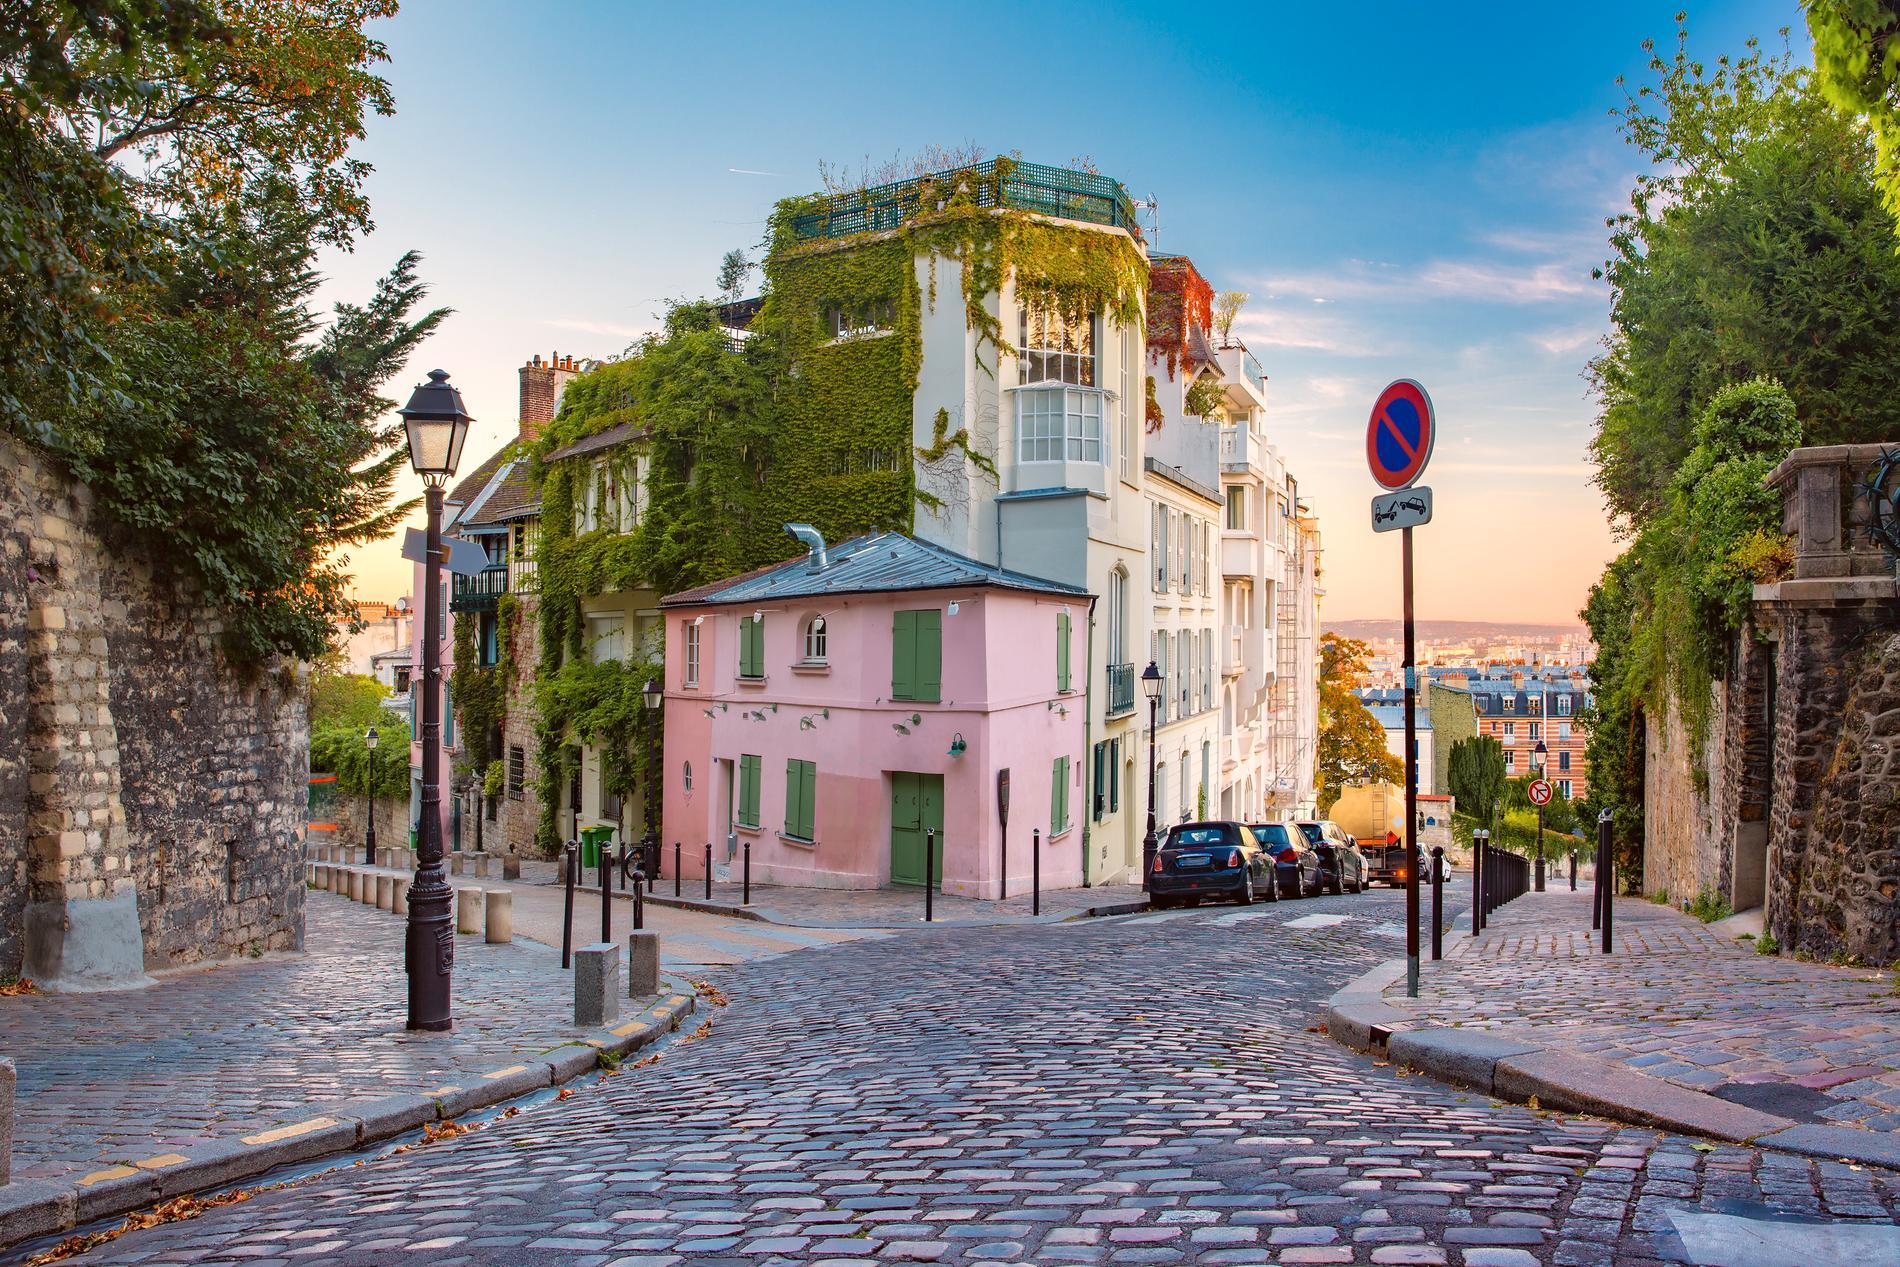 Amélie från Montmartre utspelar sig tippat nog i Montmartre.